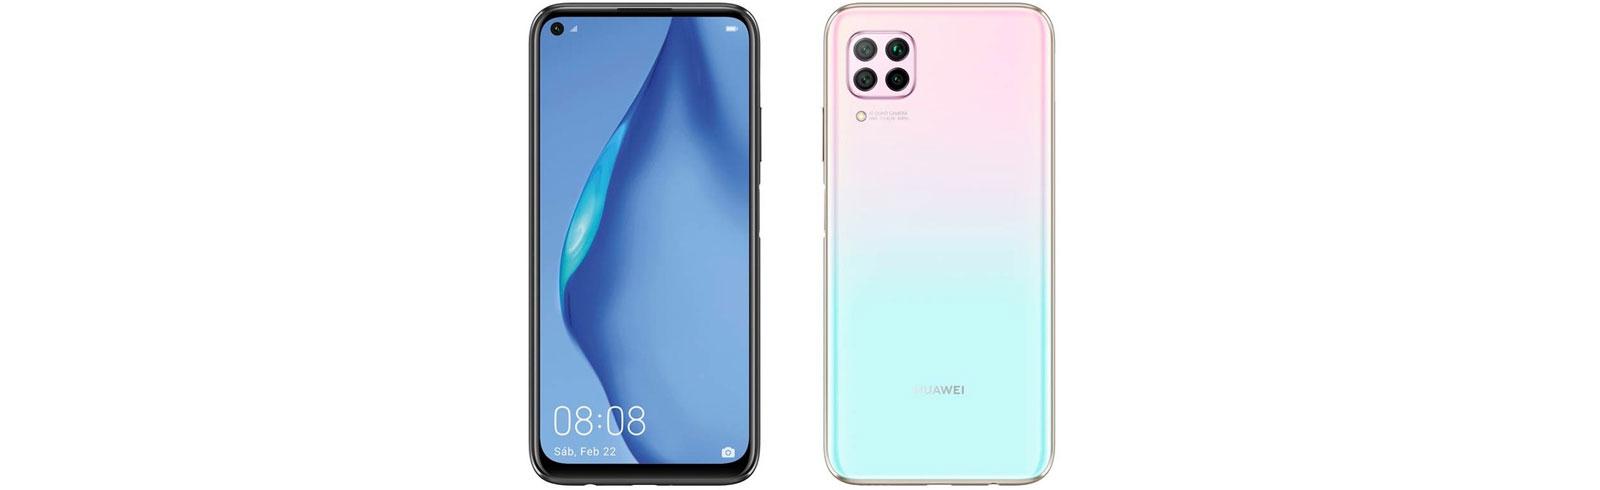 Huawei P40 Lite ide oficiálne, je rebranded novinka 6 SE